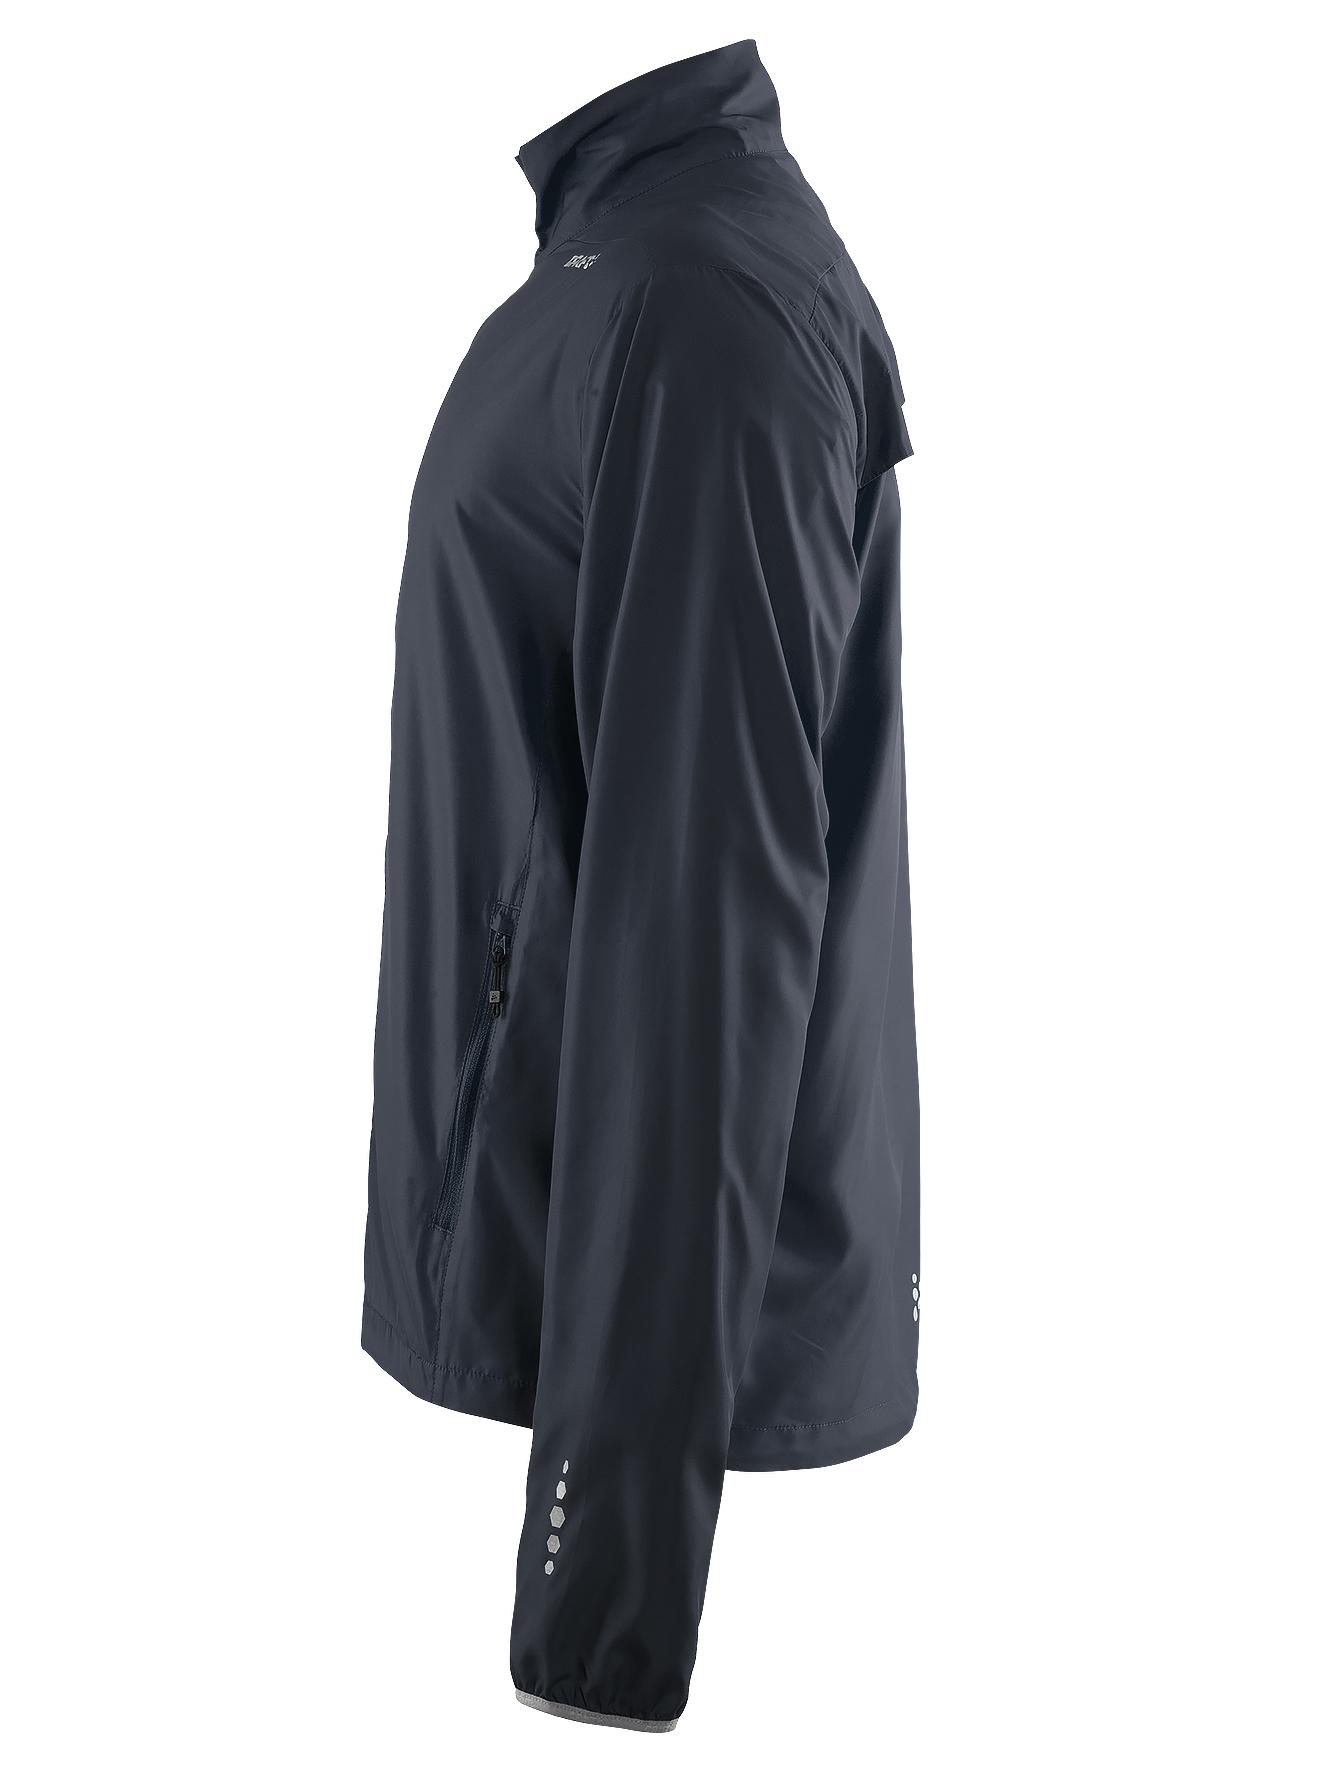 Craft Mind Run мужской костюм для бега темно-синий - 4